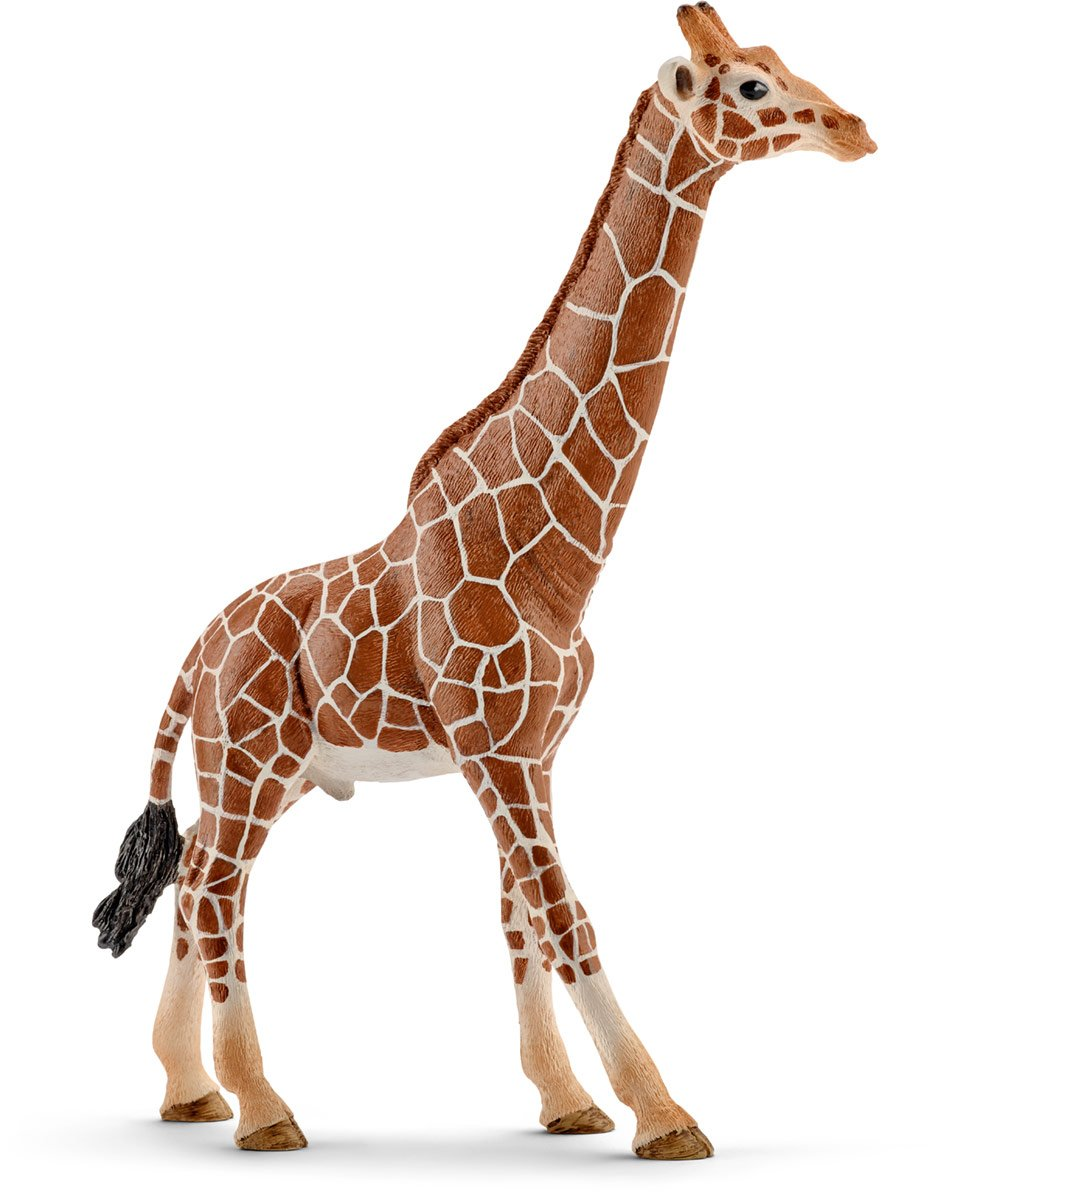 A Schleich Male Africa Giraffe Toy Figure